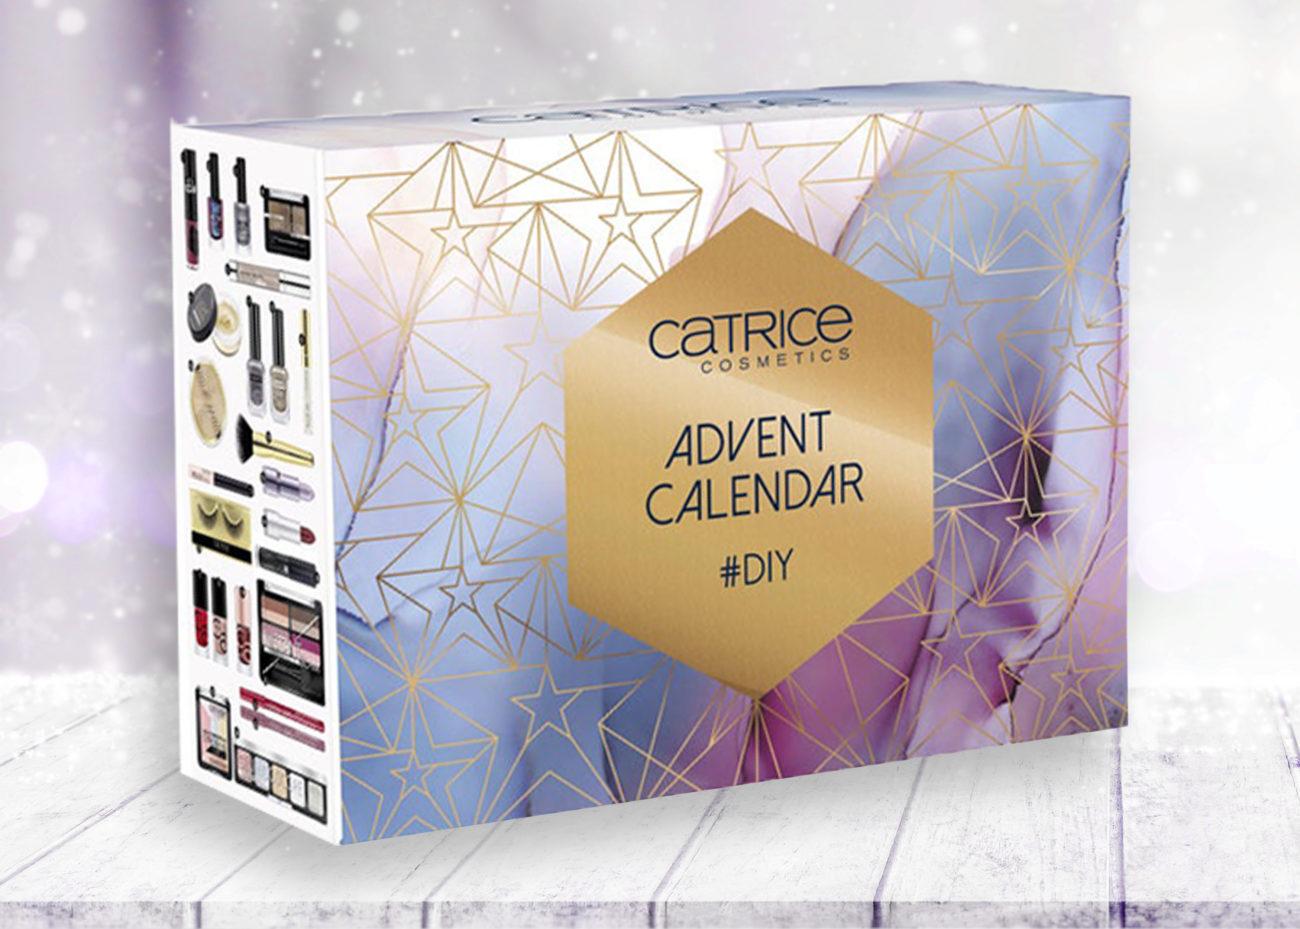 Catrice Adventskalender 2019